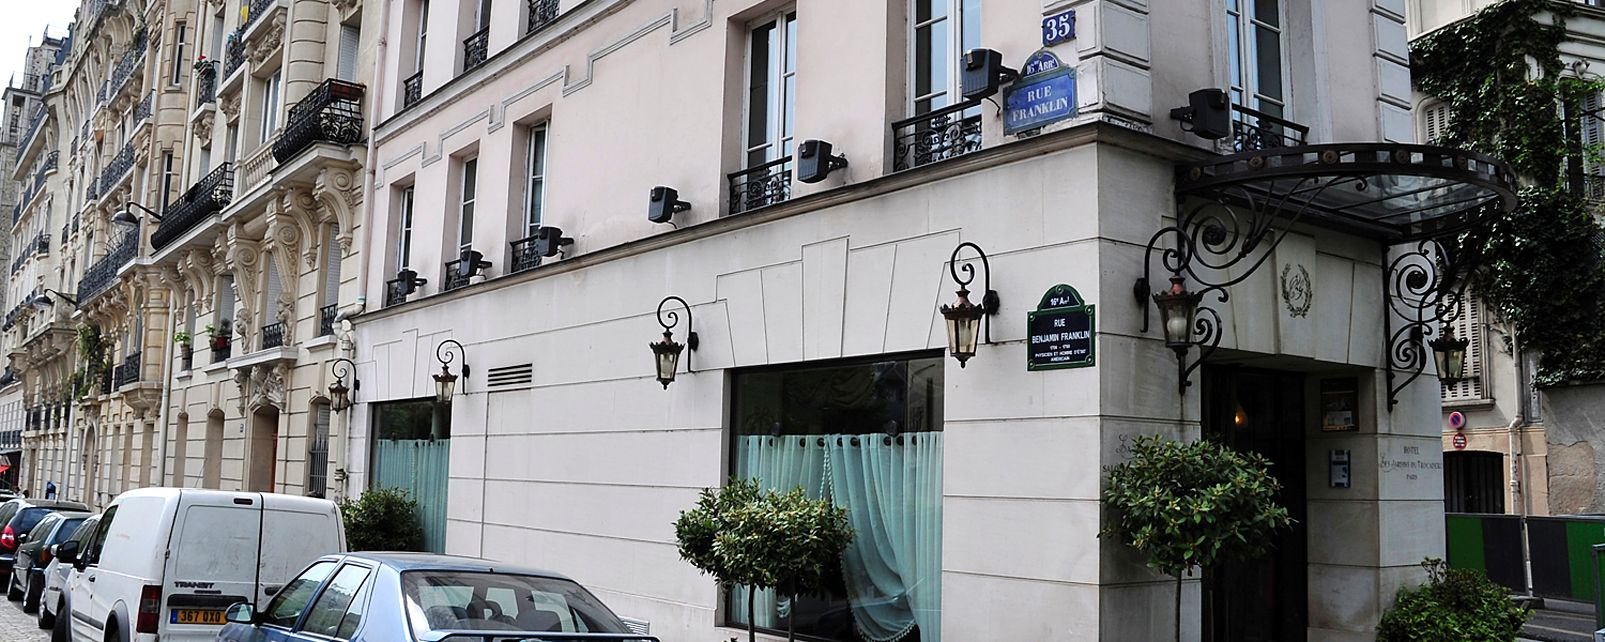 Hotel les jardins du trocadero paris for Hotel les jardins paris